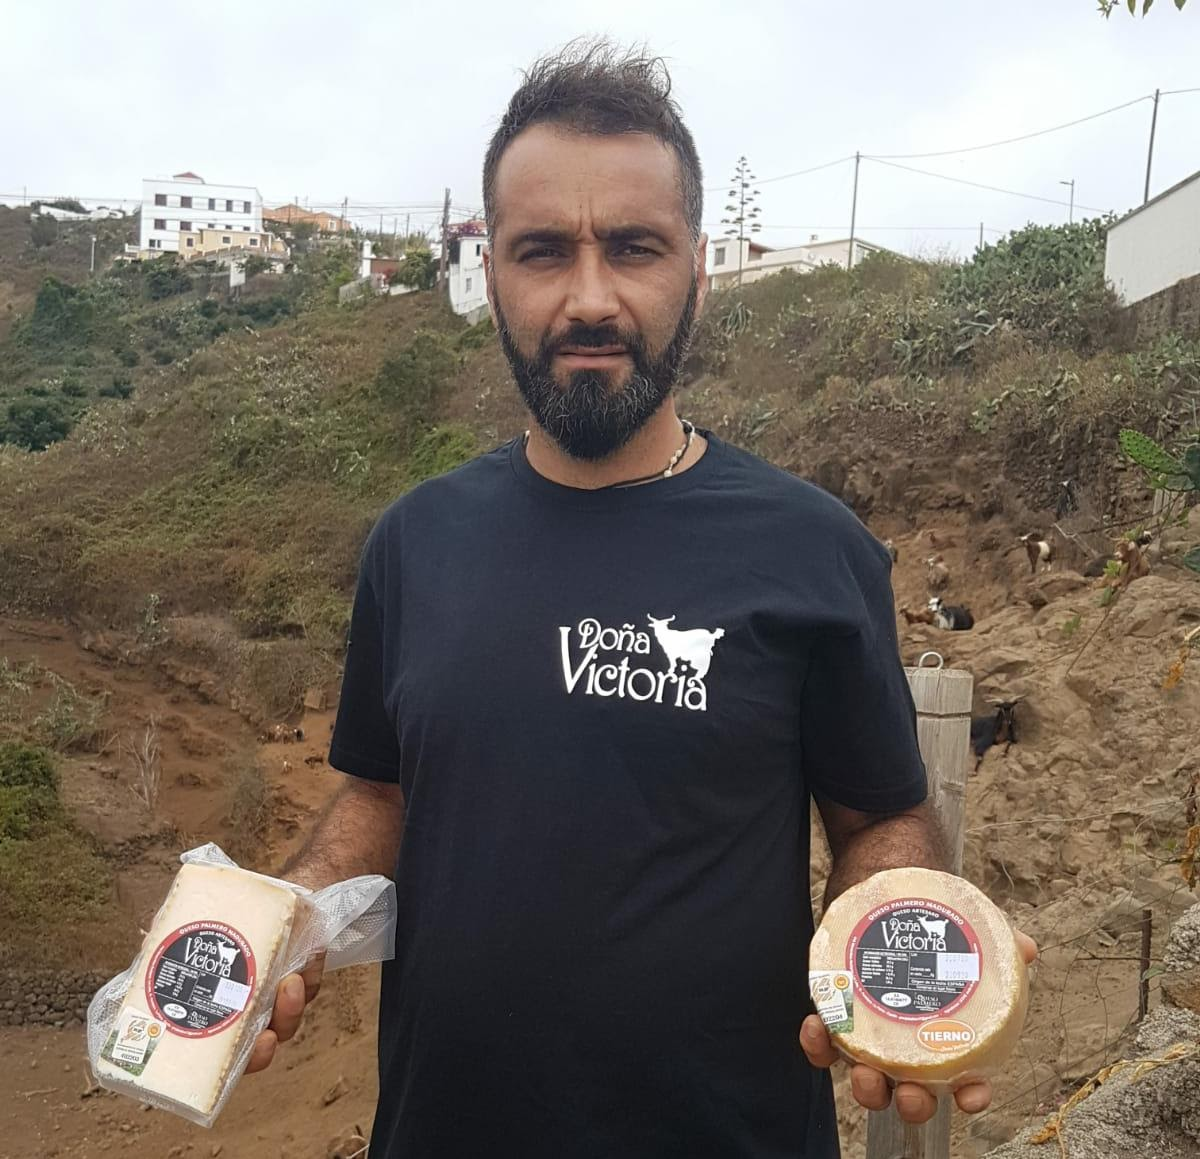 Quesos Doña Vicotira elaborador por José Manuel Abreu Rodríguez.